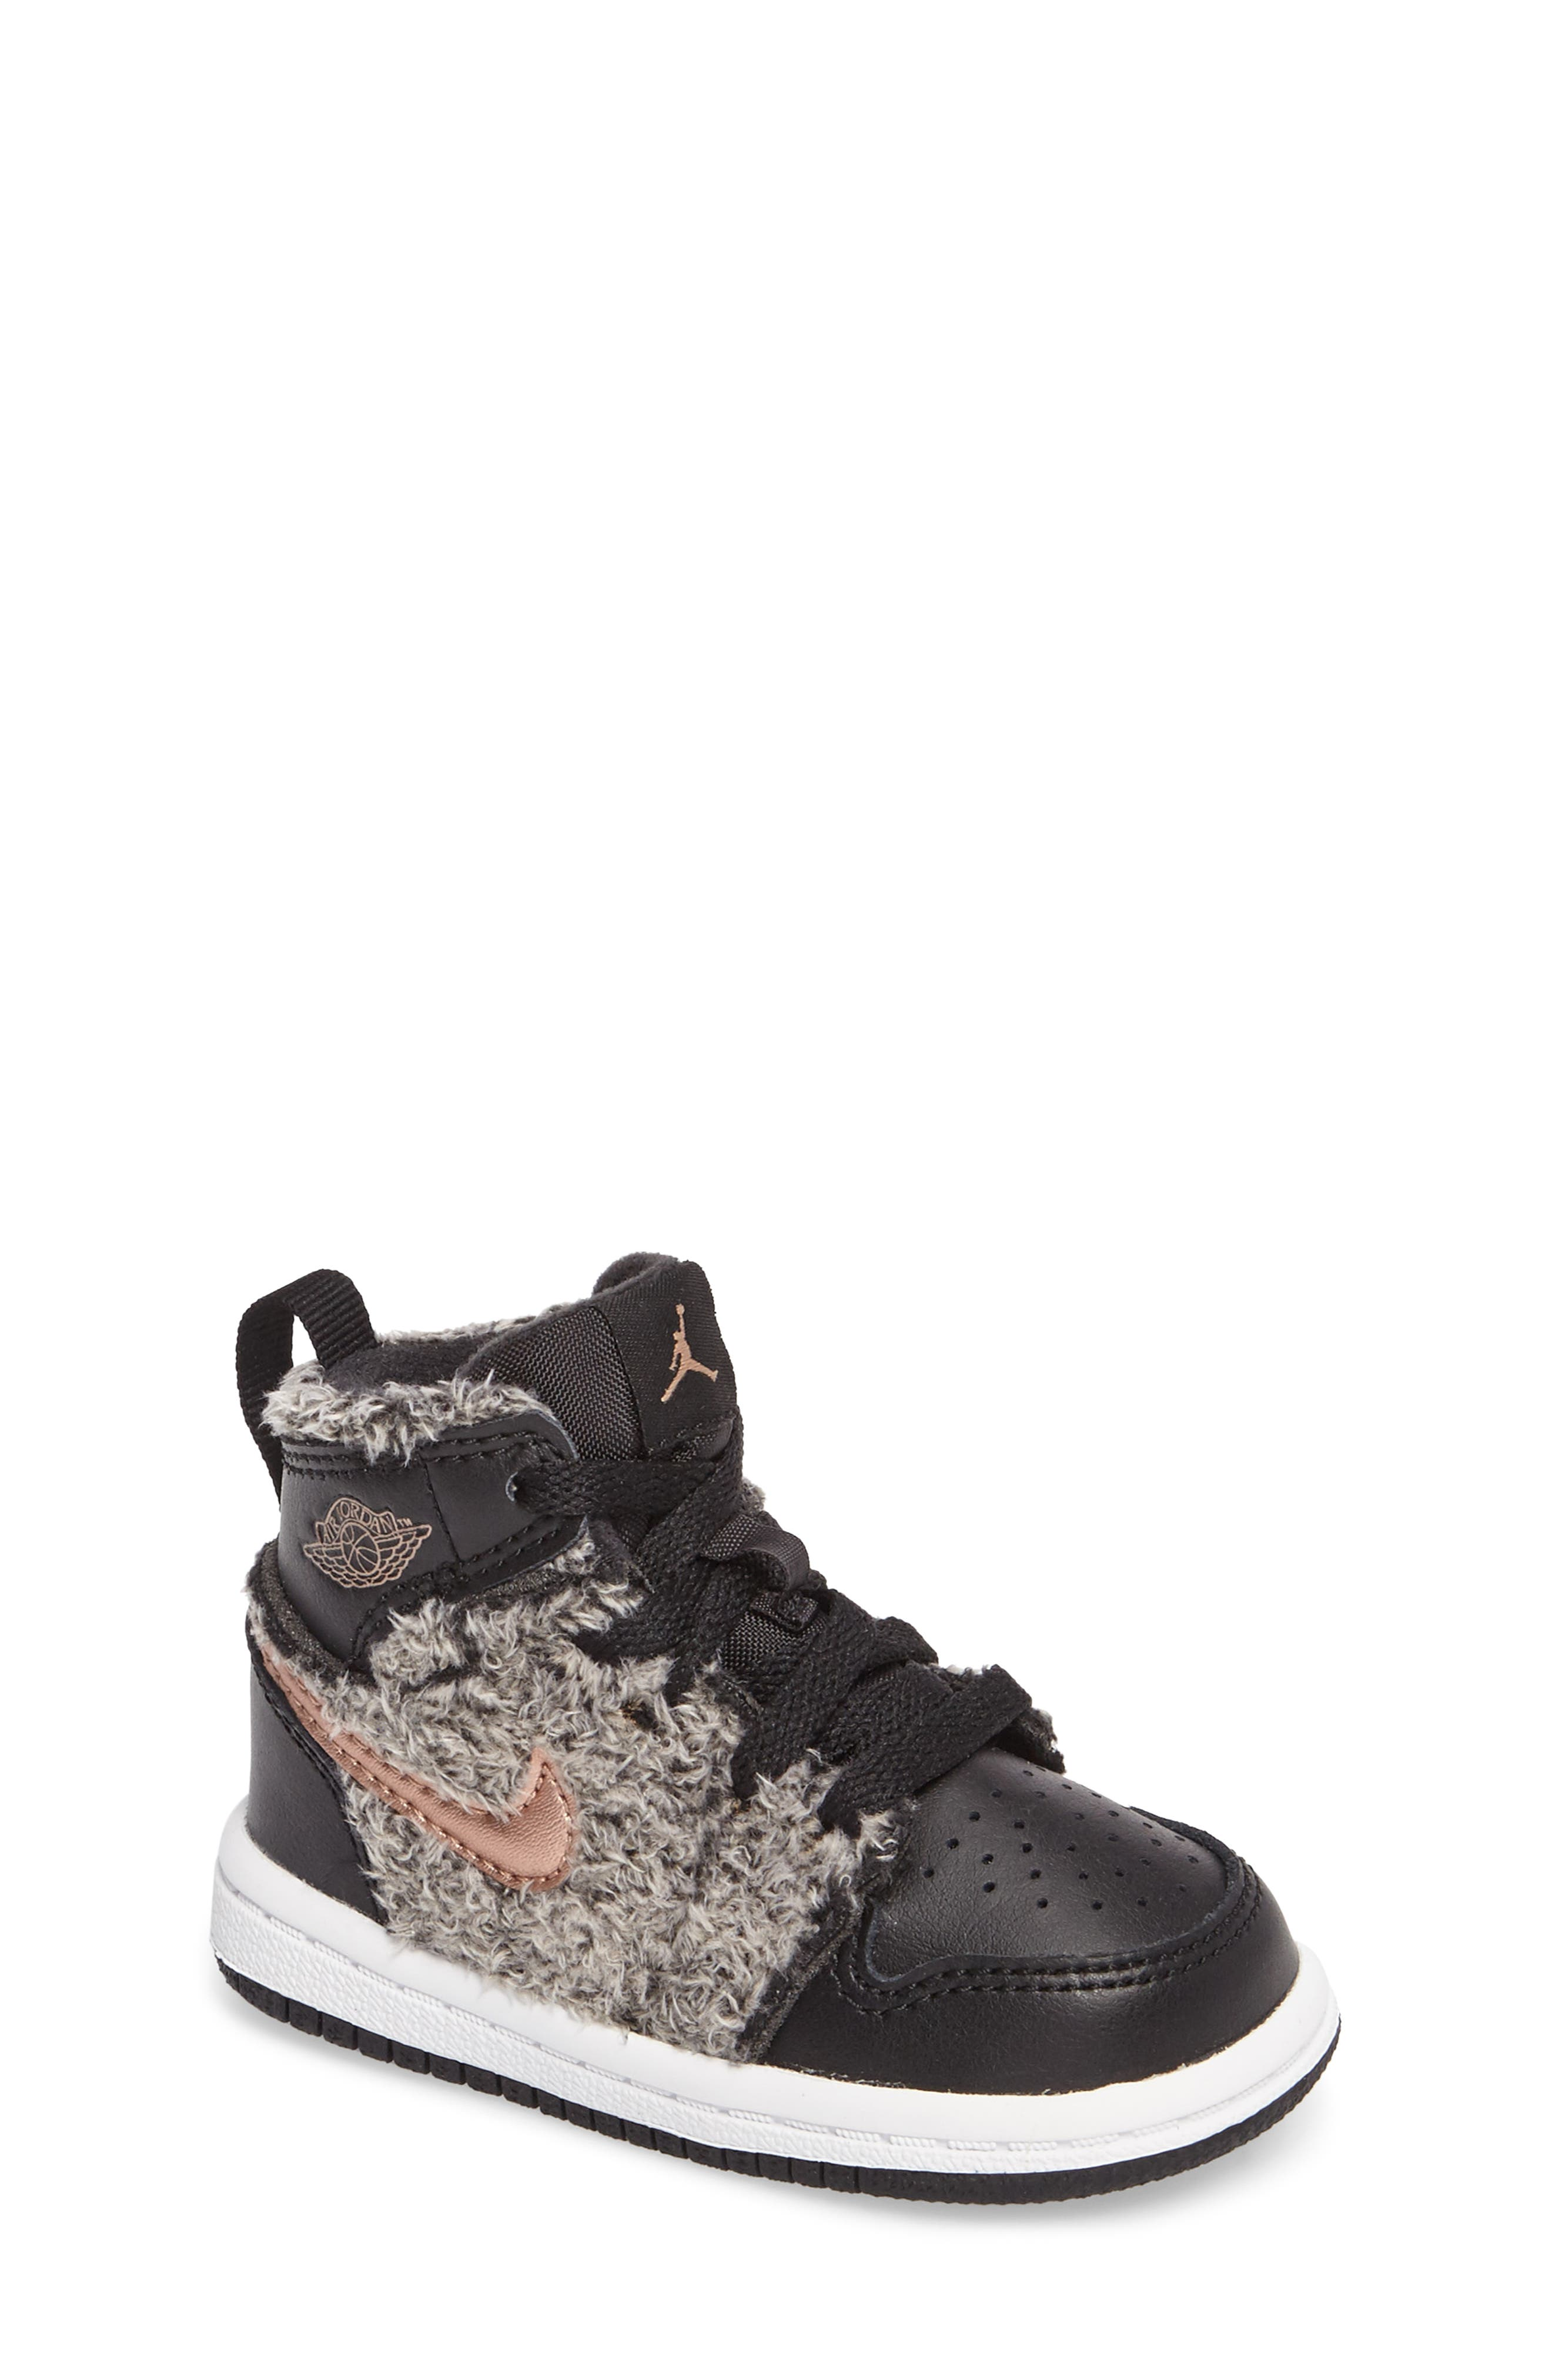 Alternate Image 1 Selected - Nike Air Jordan 1 Retro High Top Basketball Shoe (Baby, Walker and Toddler)